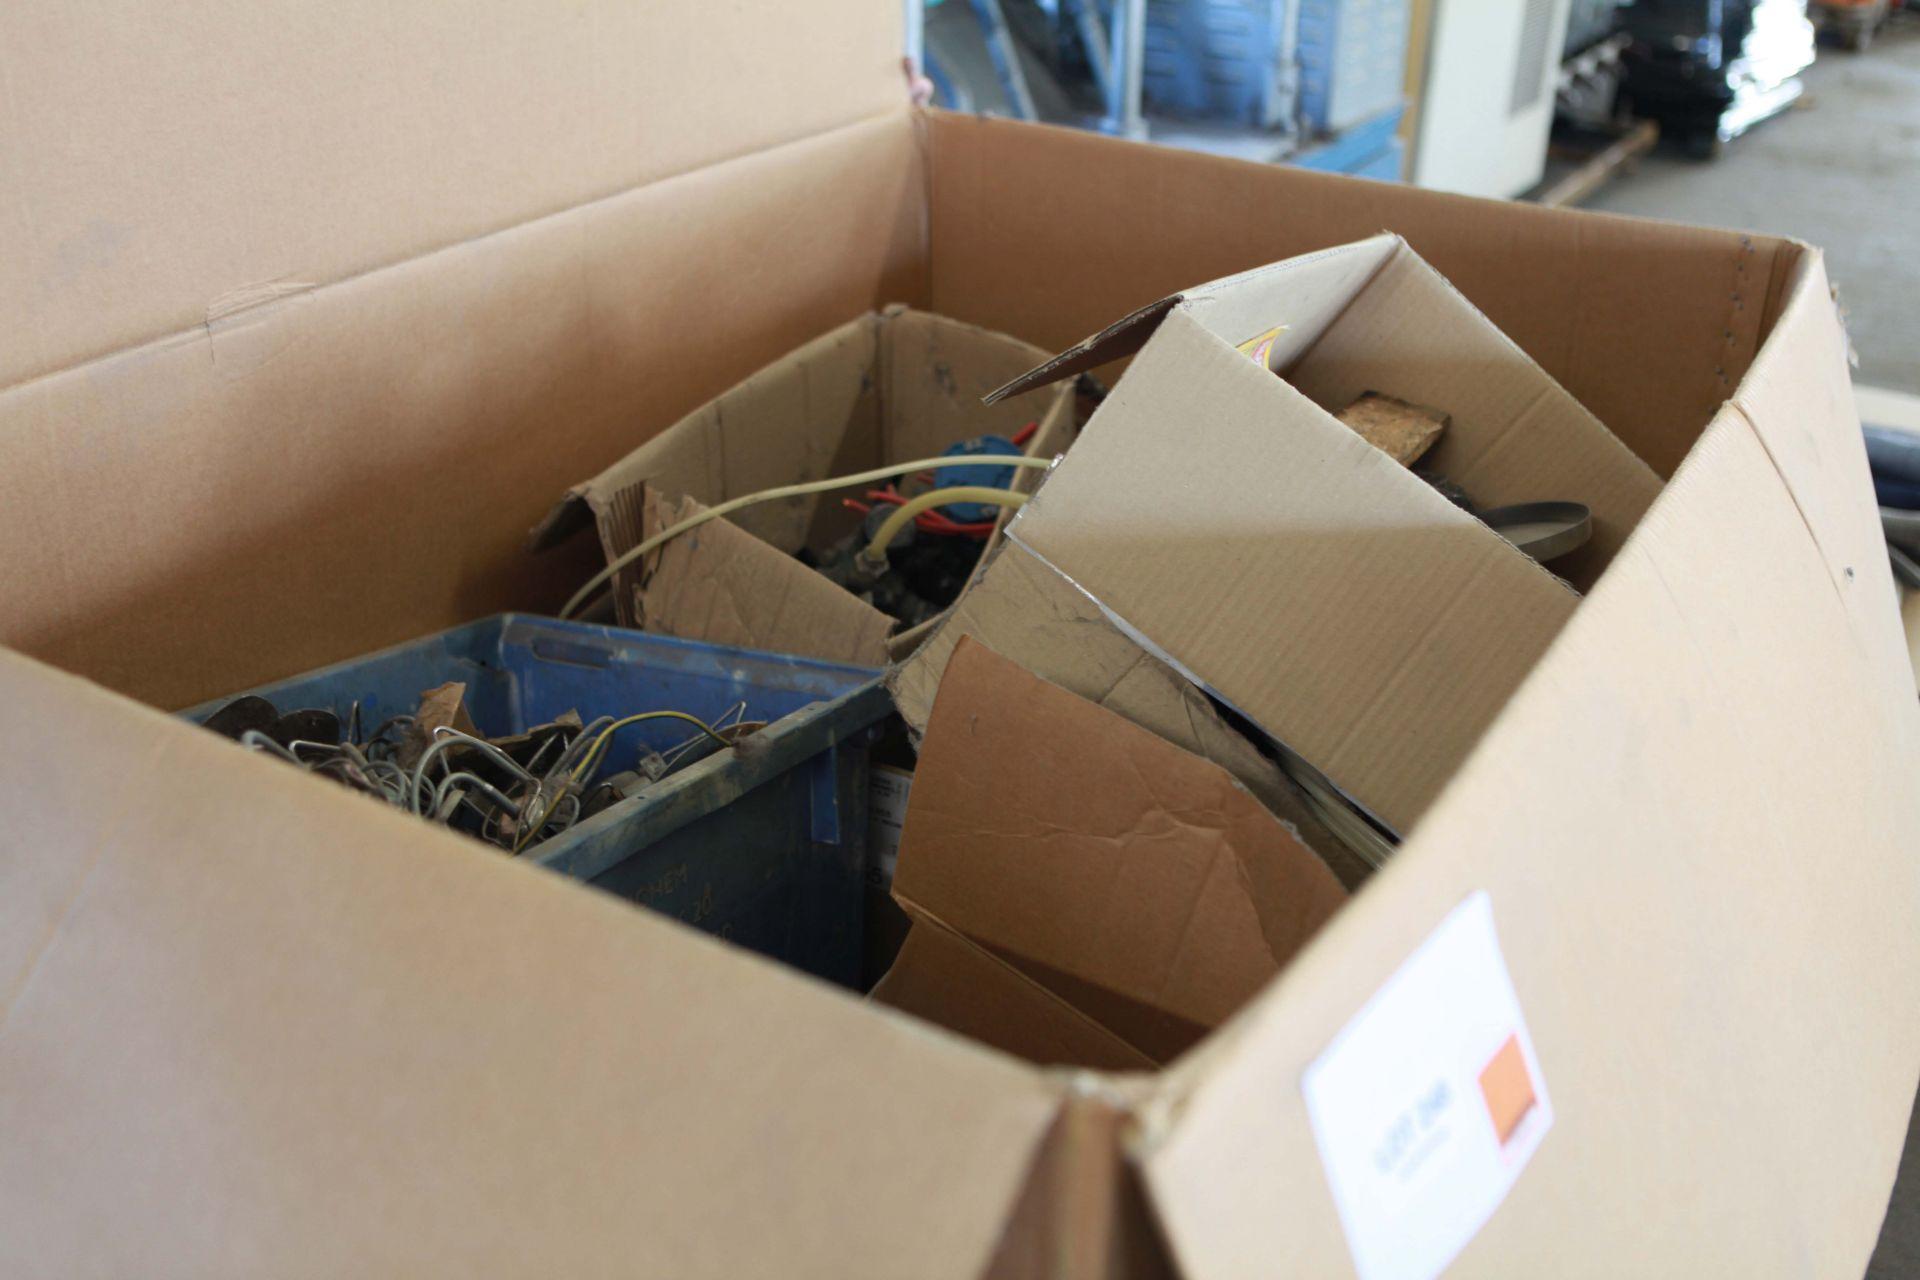 Large cardboard carton of machine spares